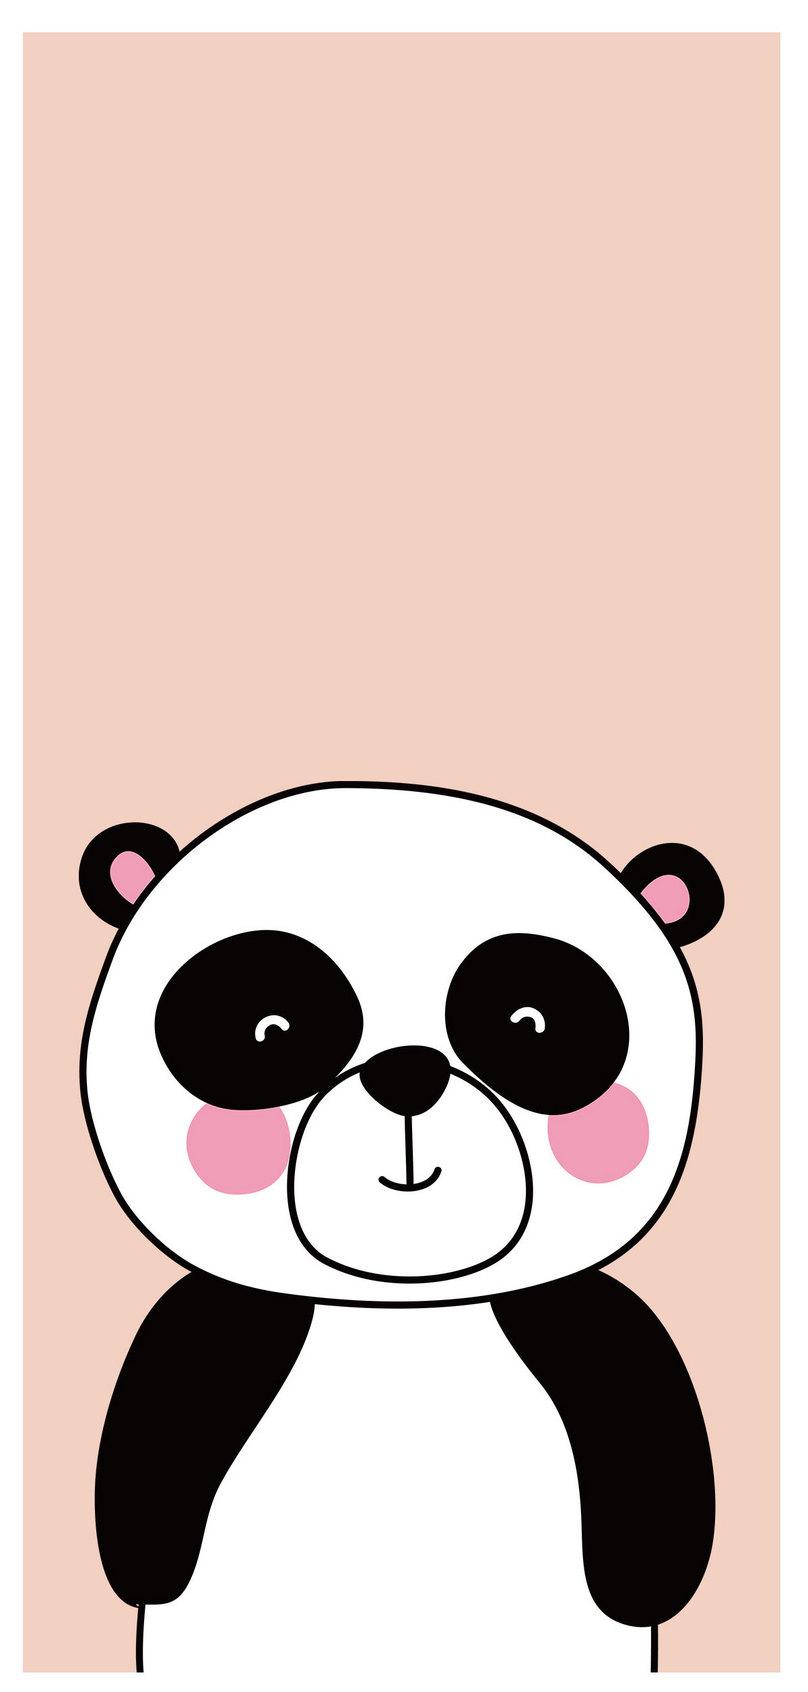 Cartoon Panda Mobile Phone Wallpaper Backgrounds Images Free